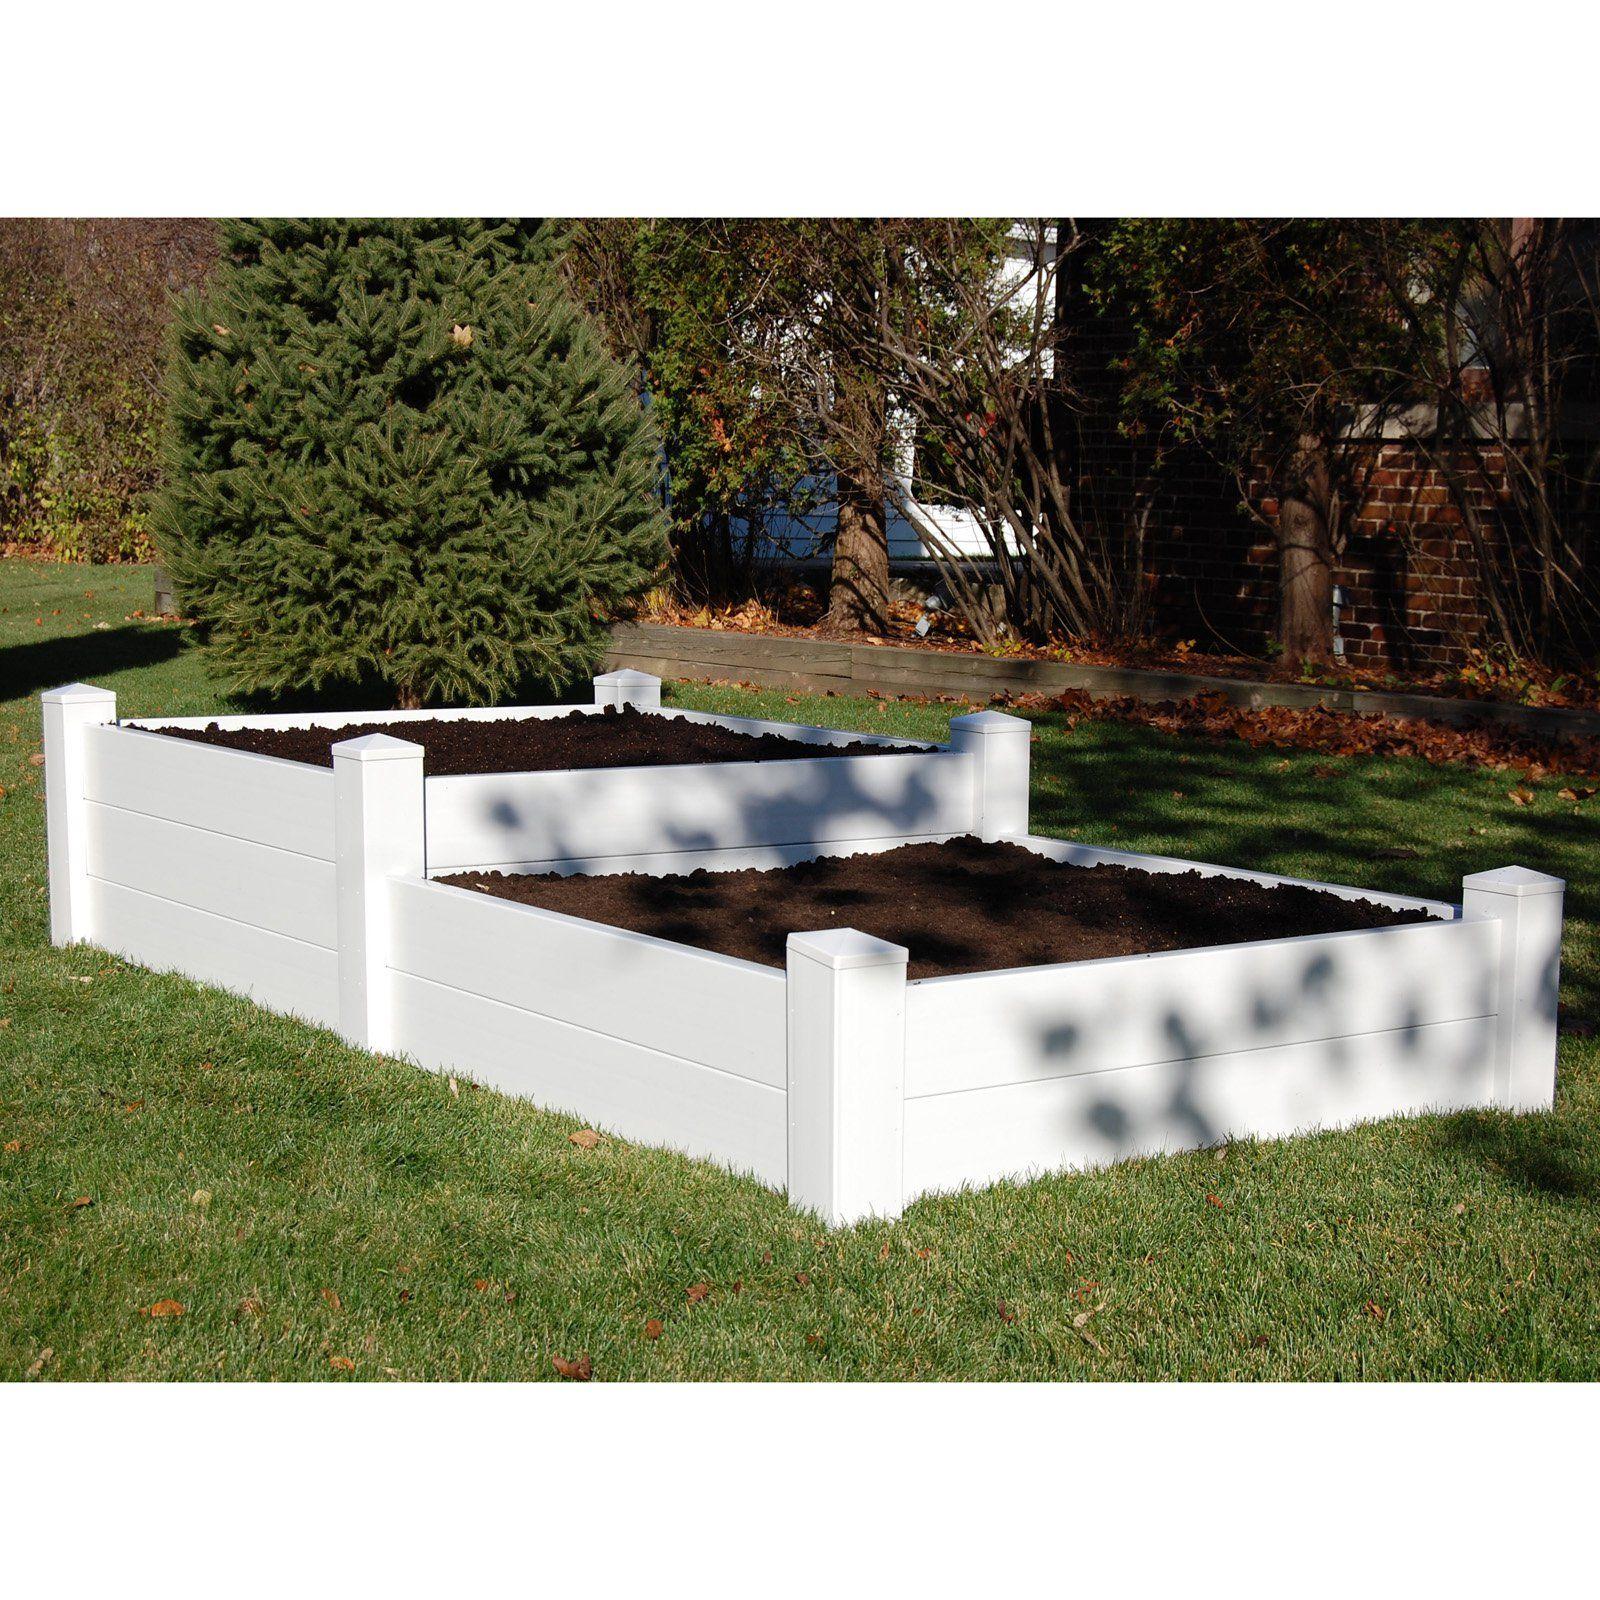 Dura Trel 4 X 8 Rectangle Split Level Raised Planter Bed Planter